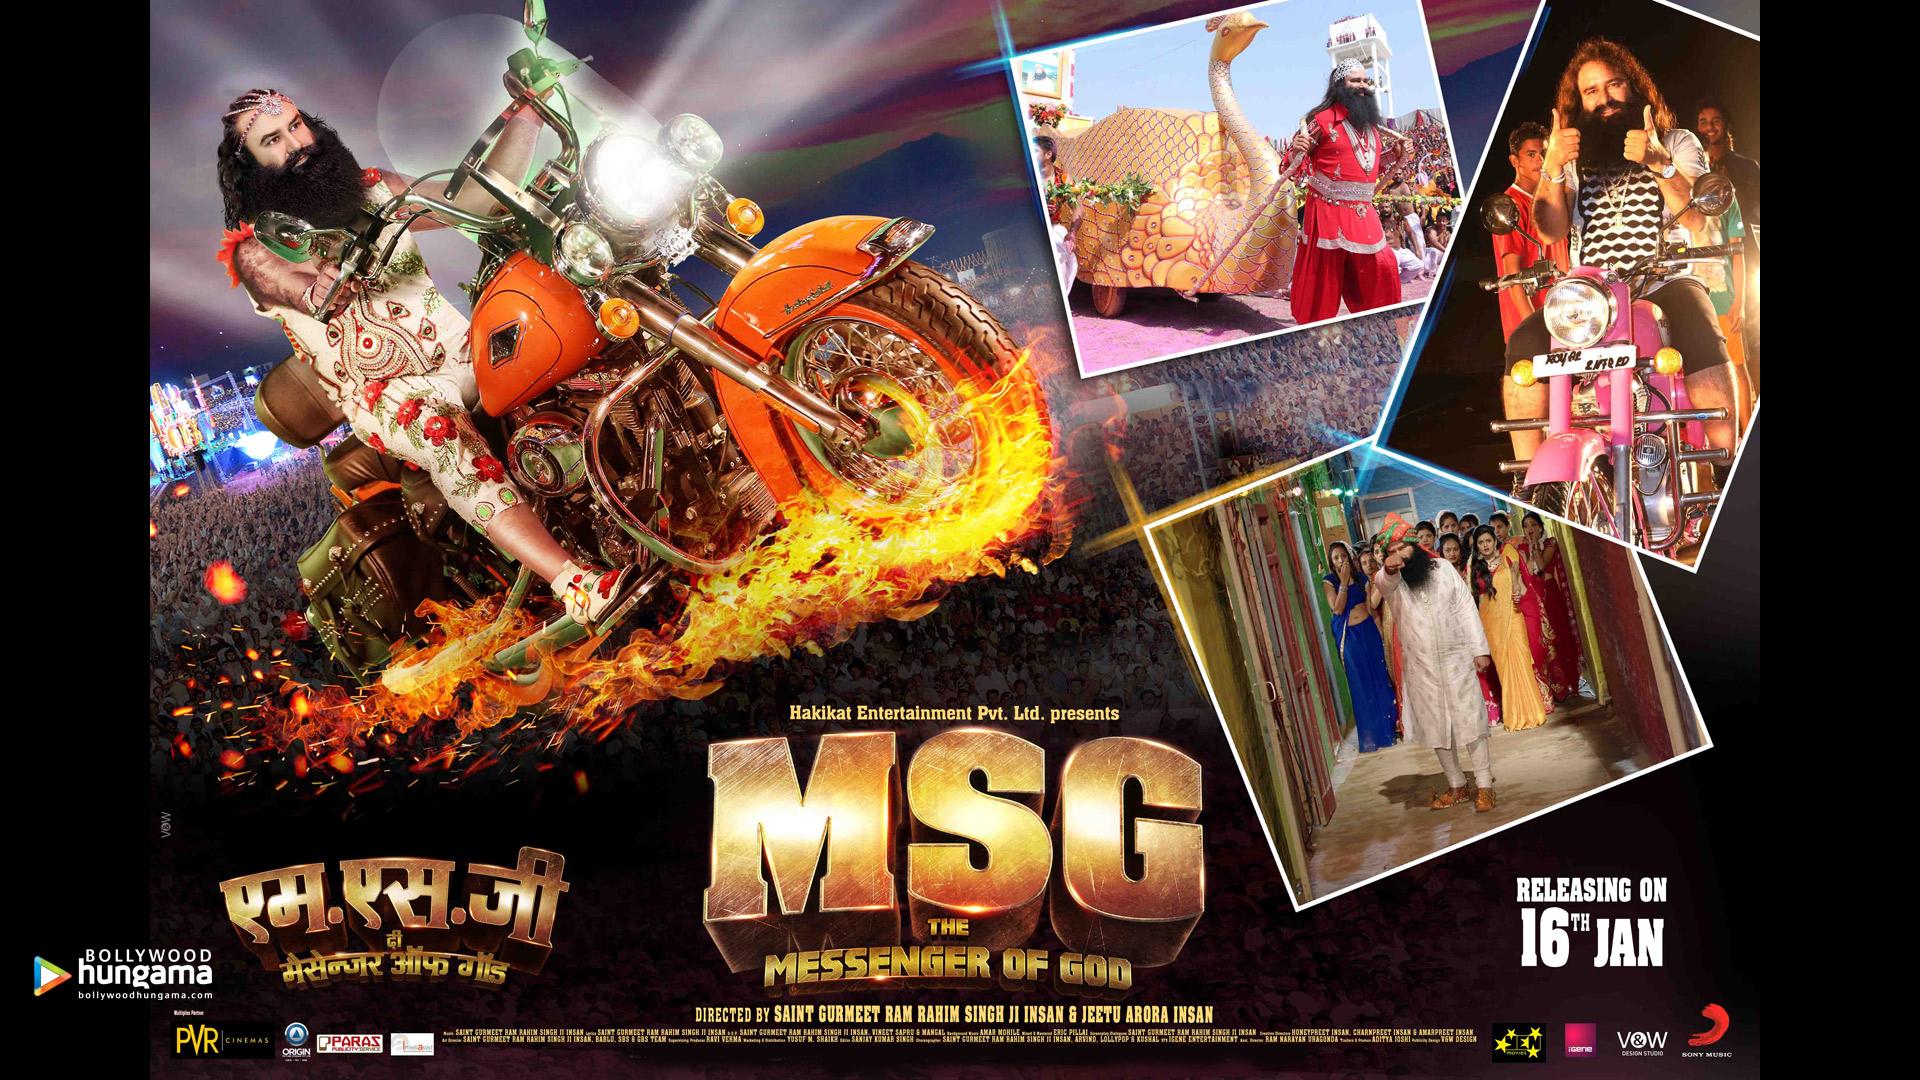 MSG The Messenger 2015 Wallpapers   msg-the-messenger-of-god-4